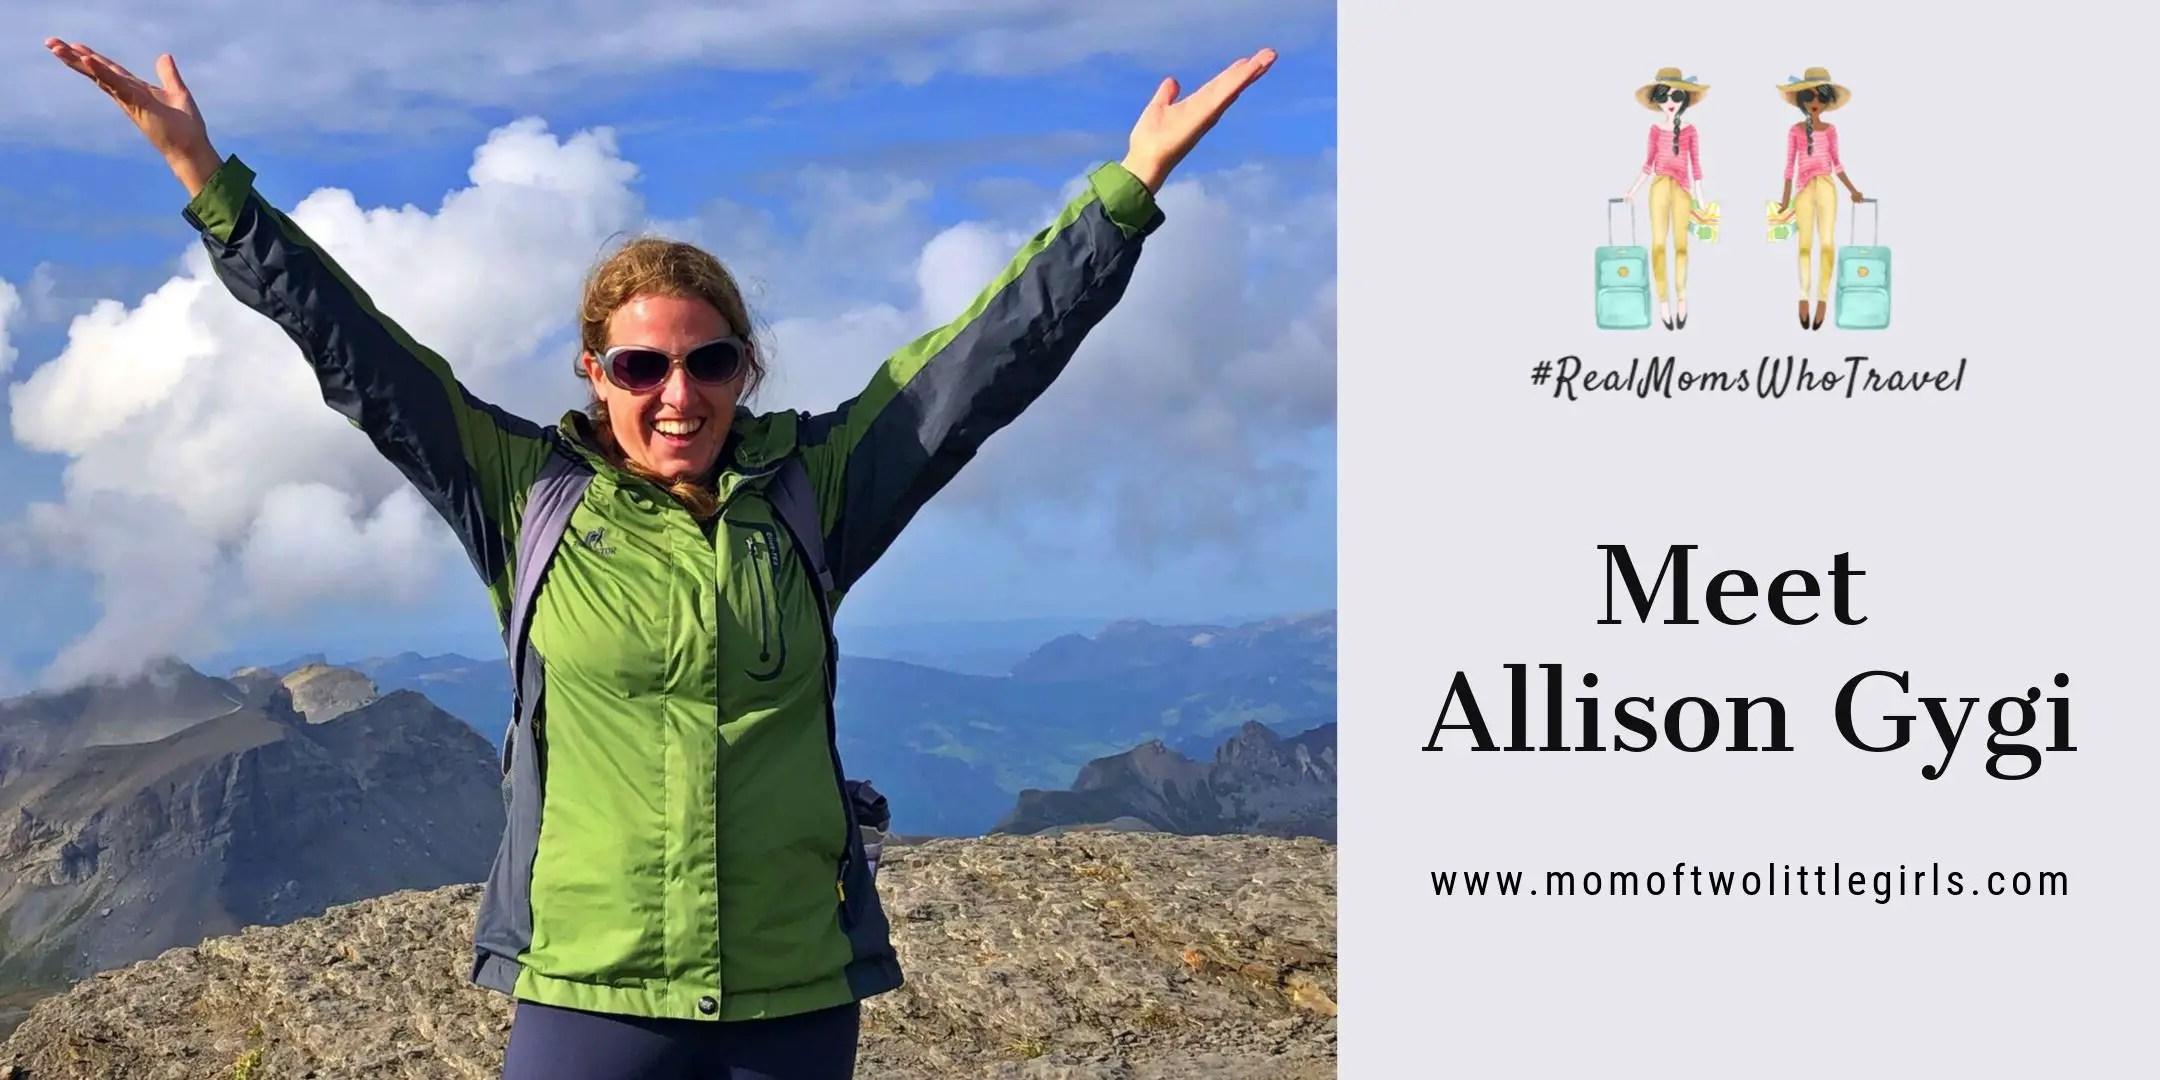 Meet Allison Gygi real moms who travel